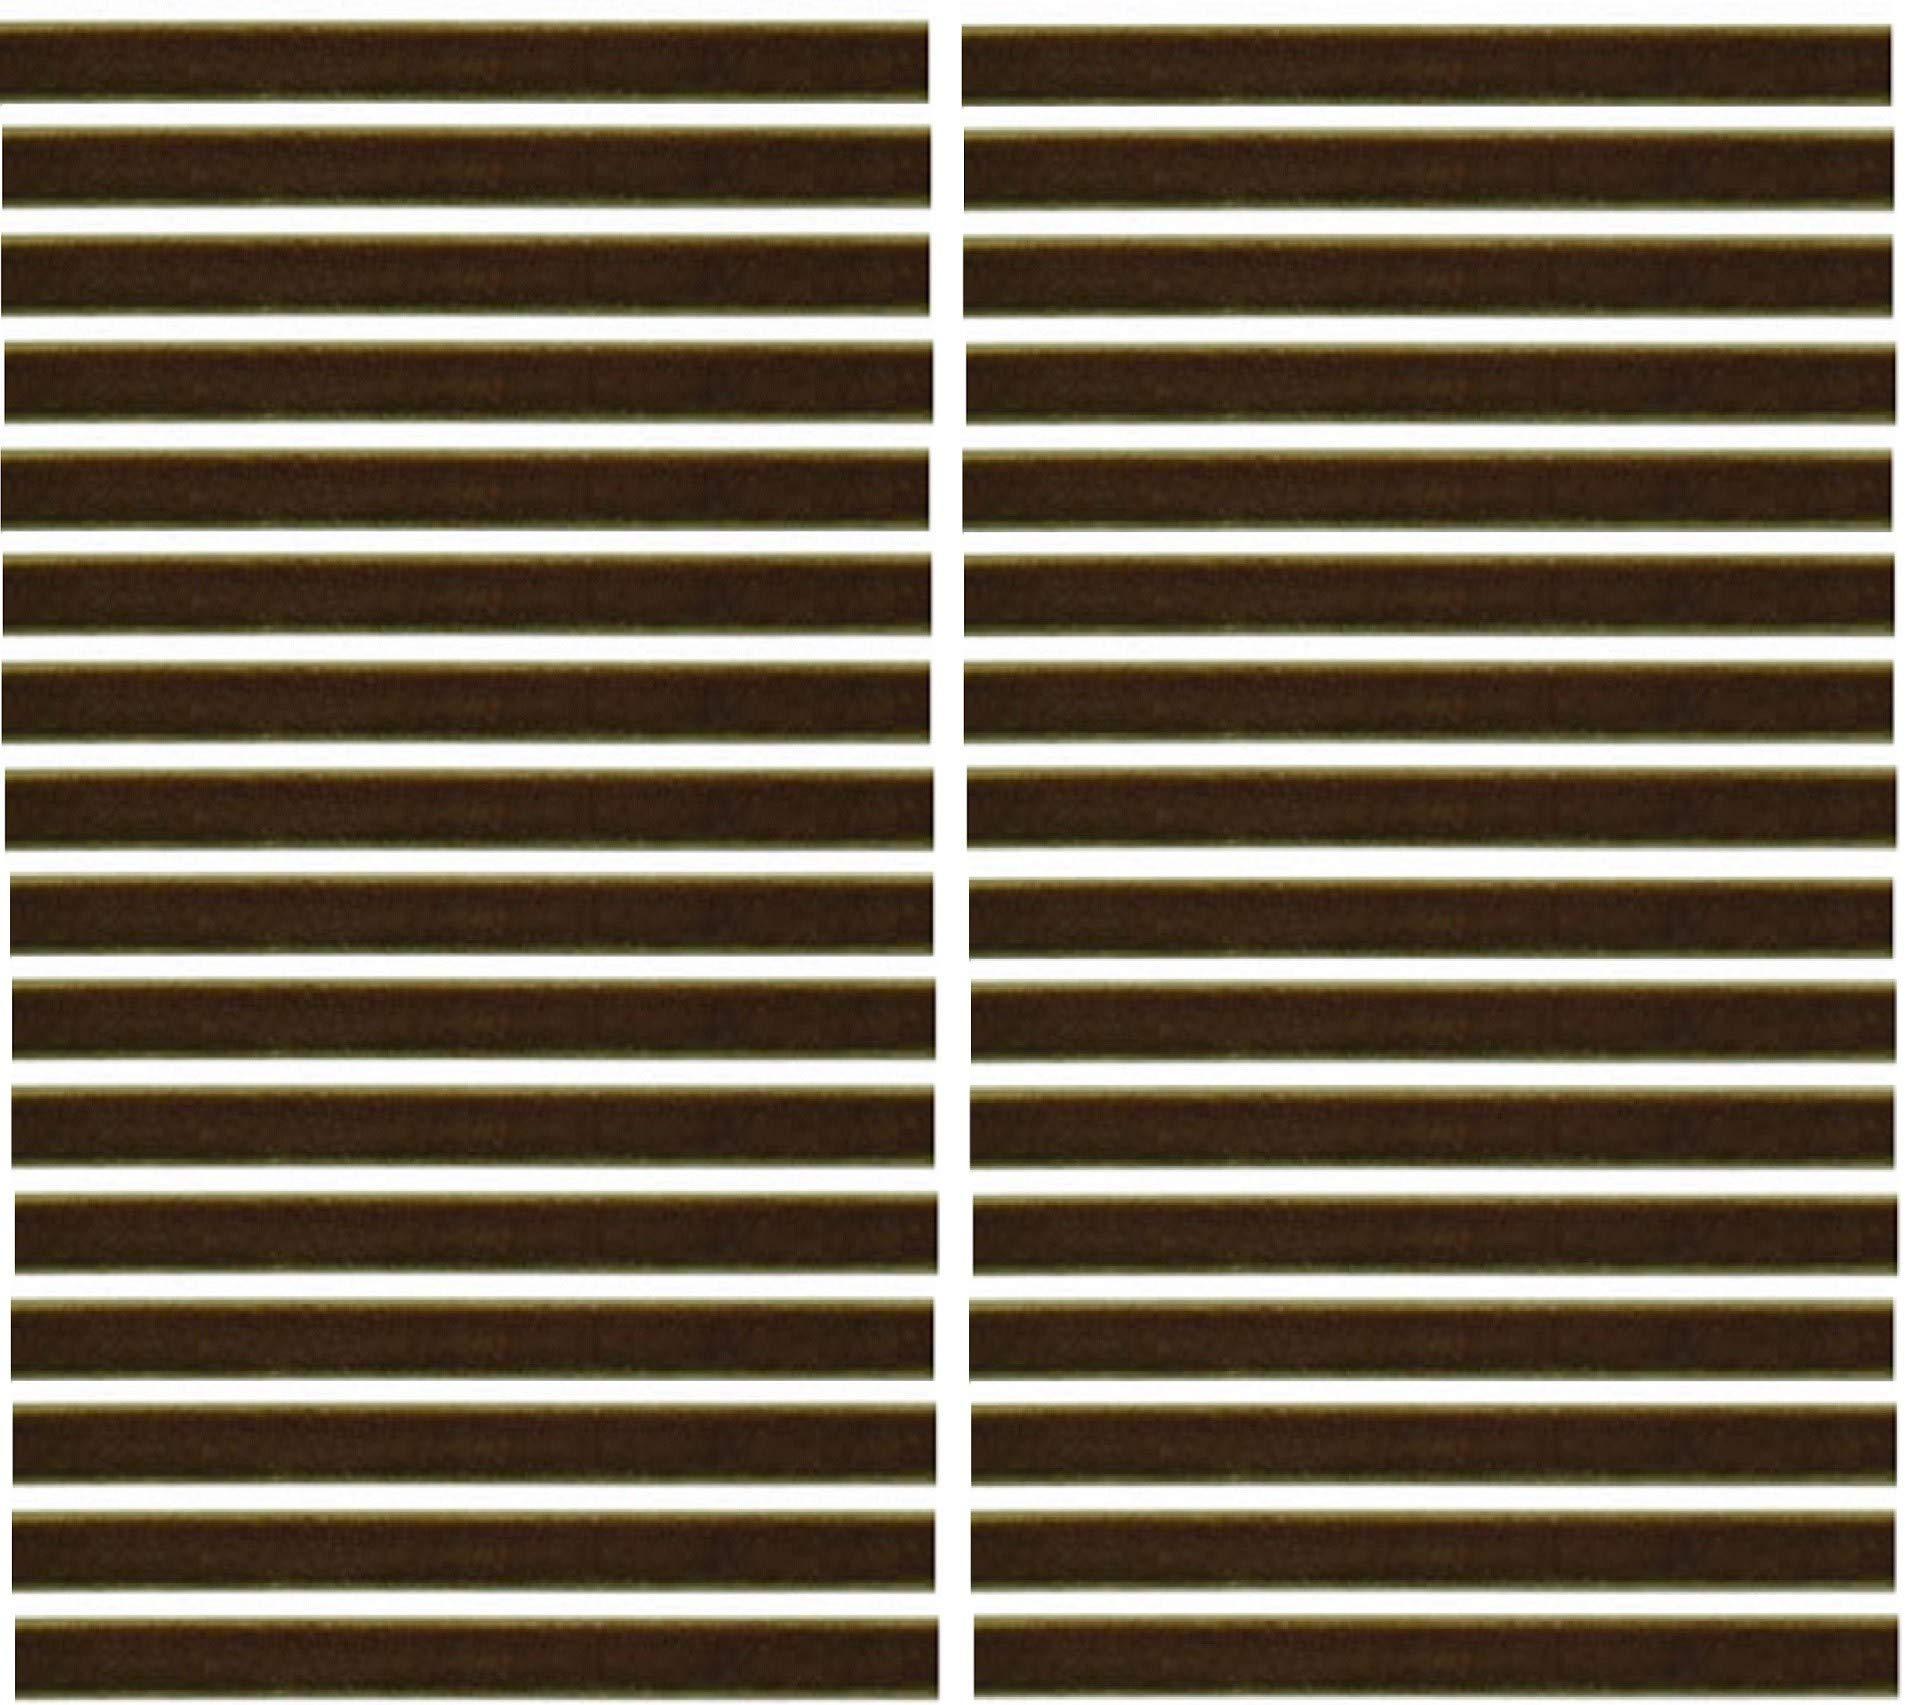 Olive Green Replacement Cleaning Strips (32-Pack) VPI Okki Nokki 3M LP Vinyl Record Album